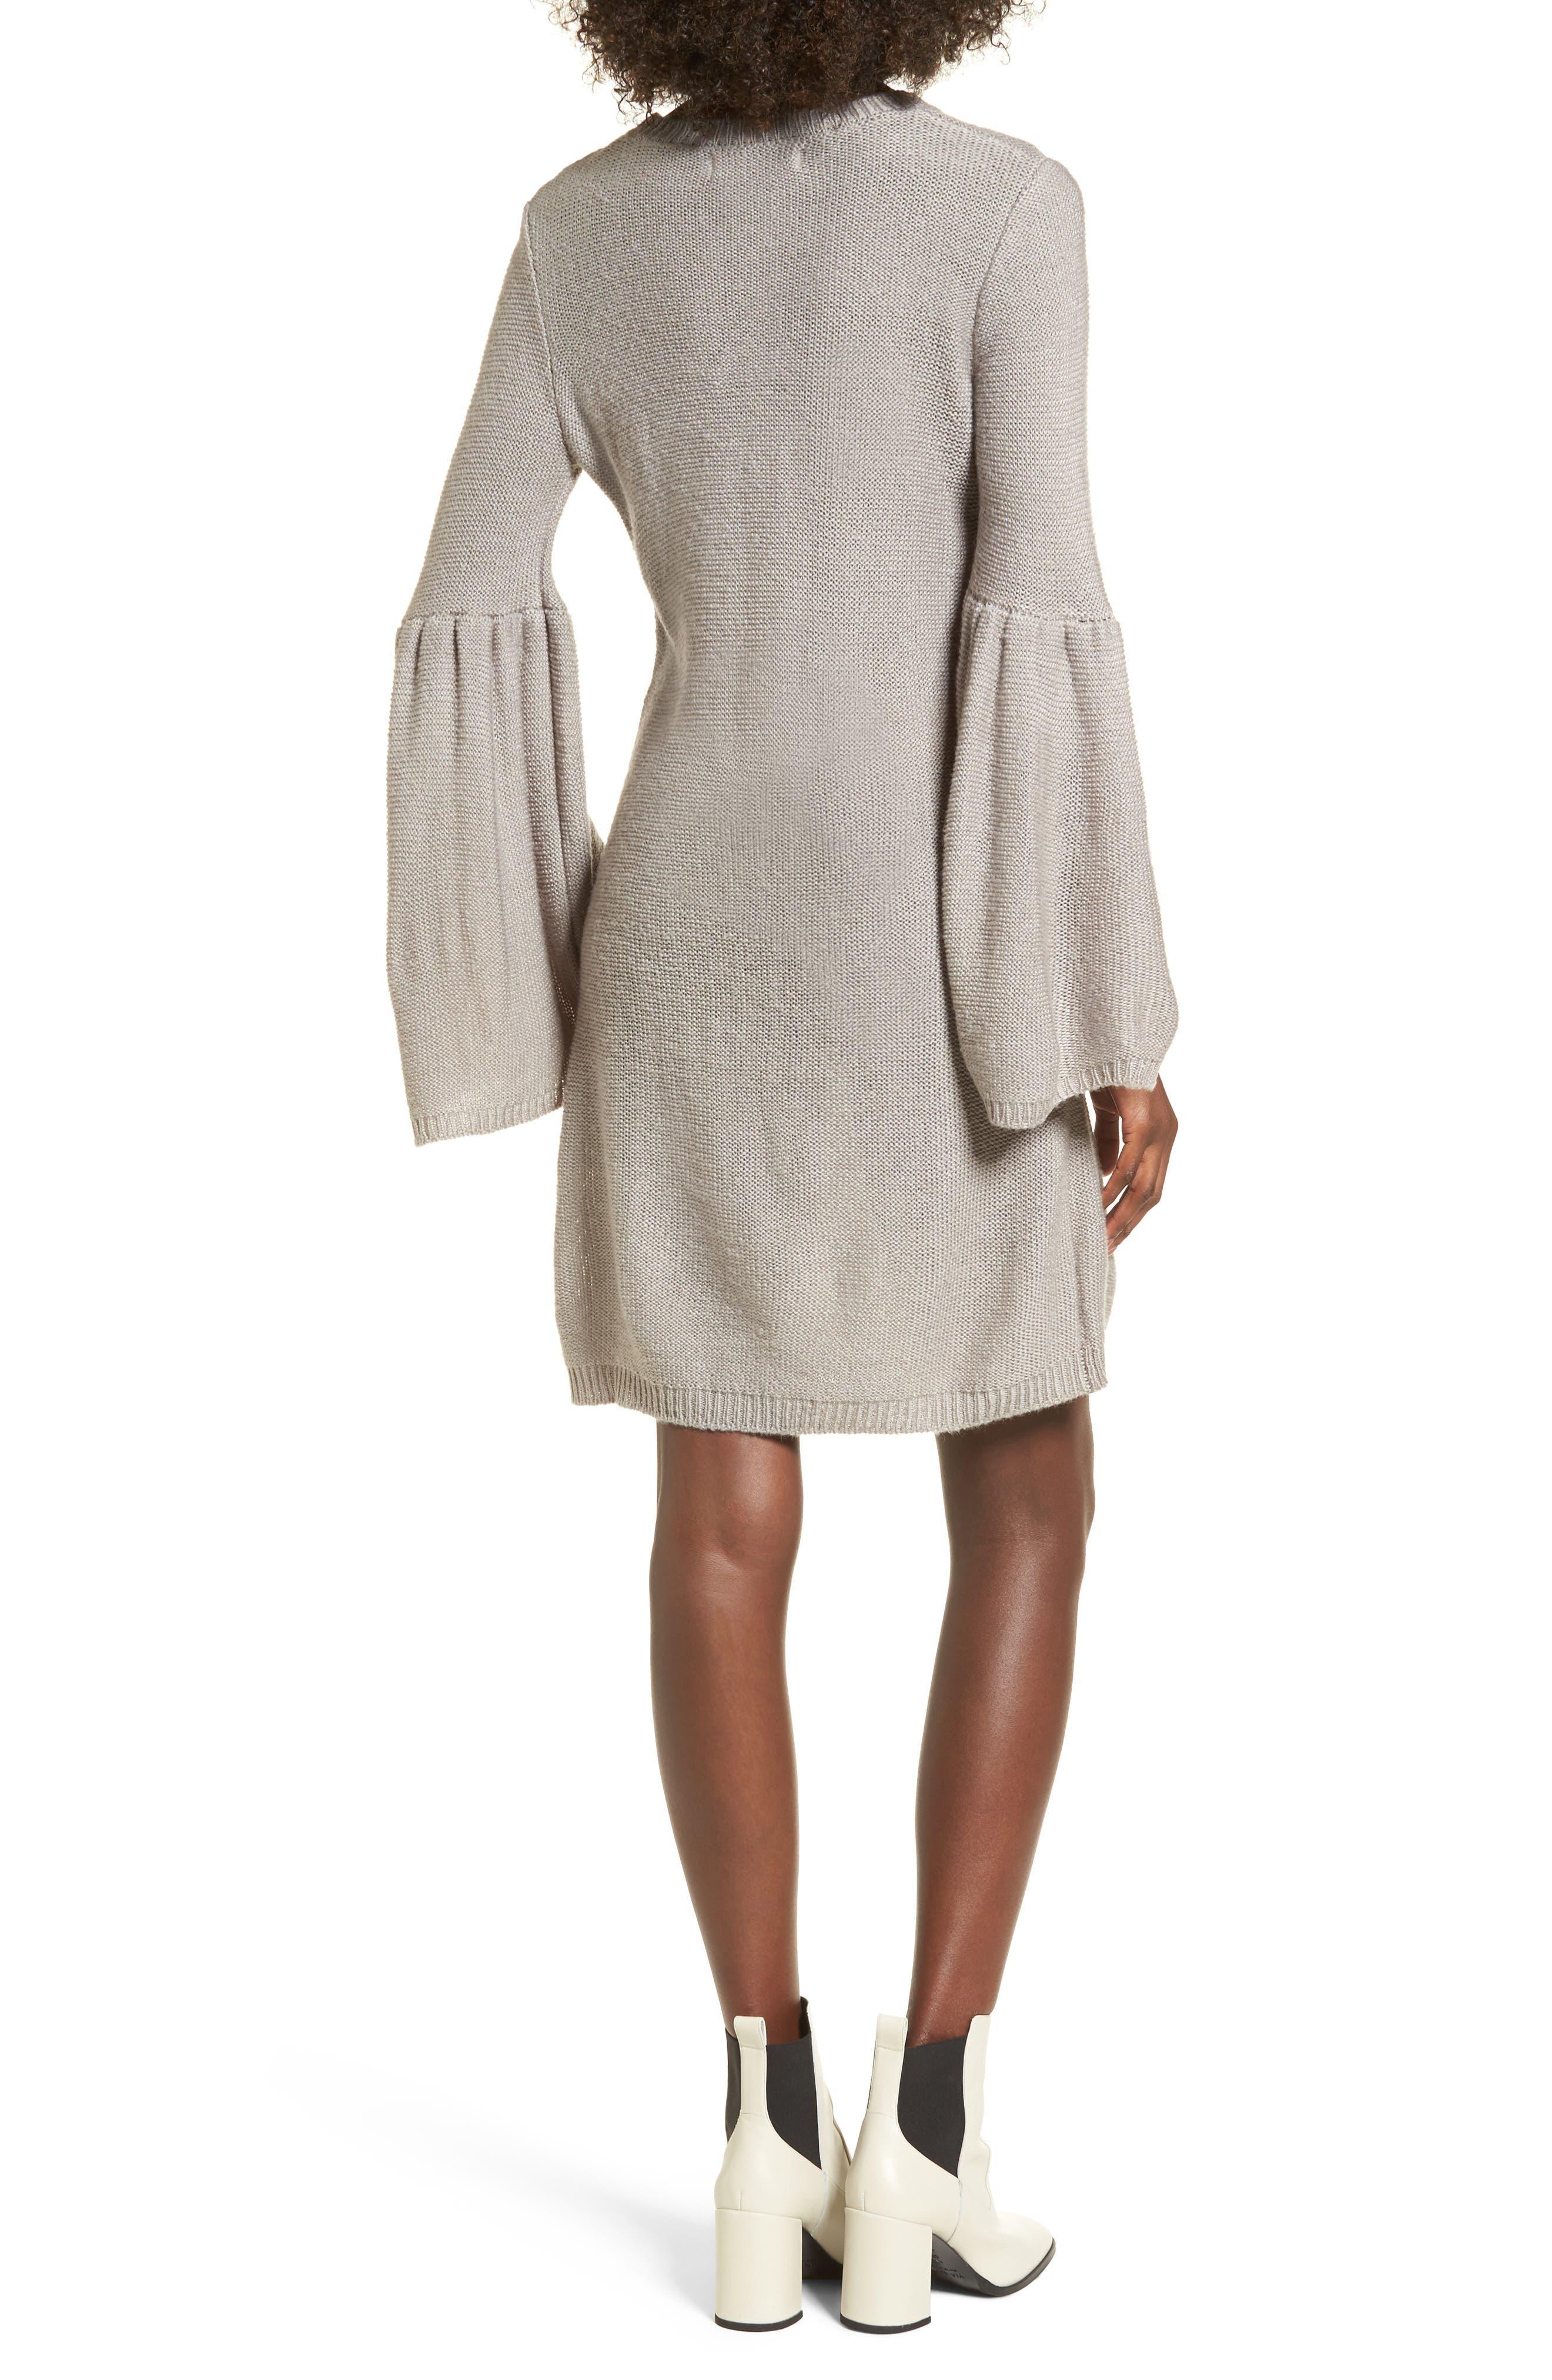 Bell Sleeve Sweater Dress,                             Alternate thumbnail 2, color,                             Light Heather Grey